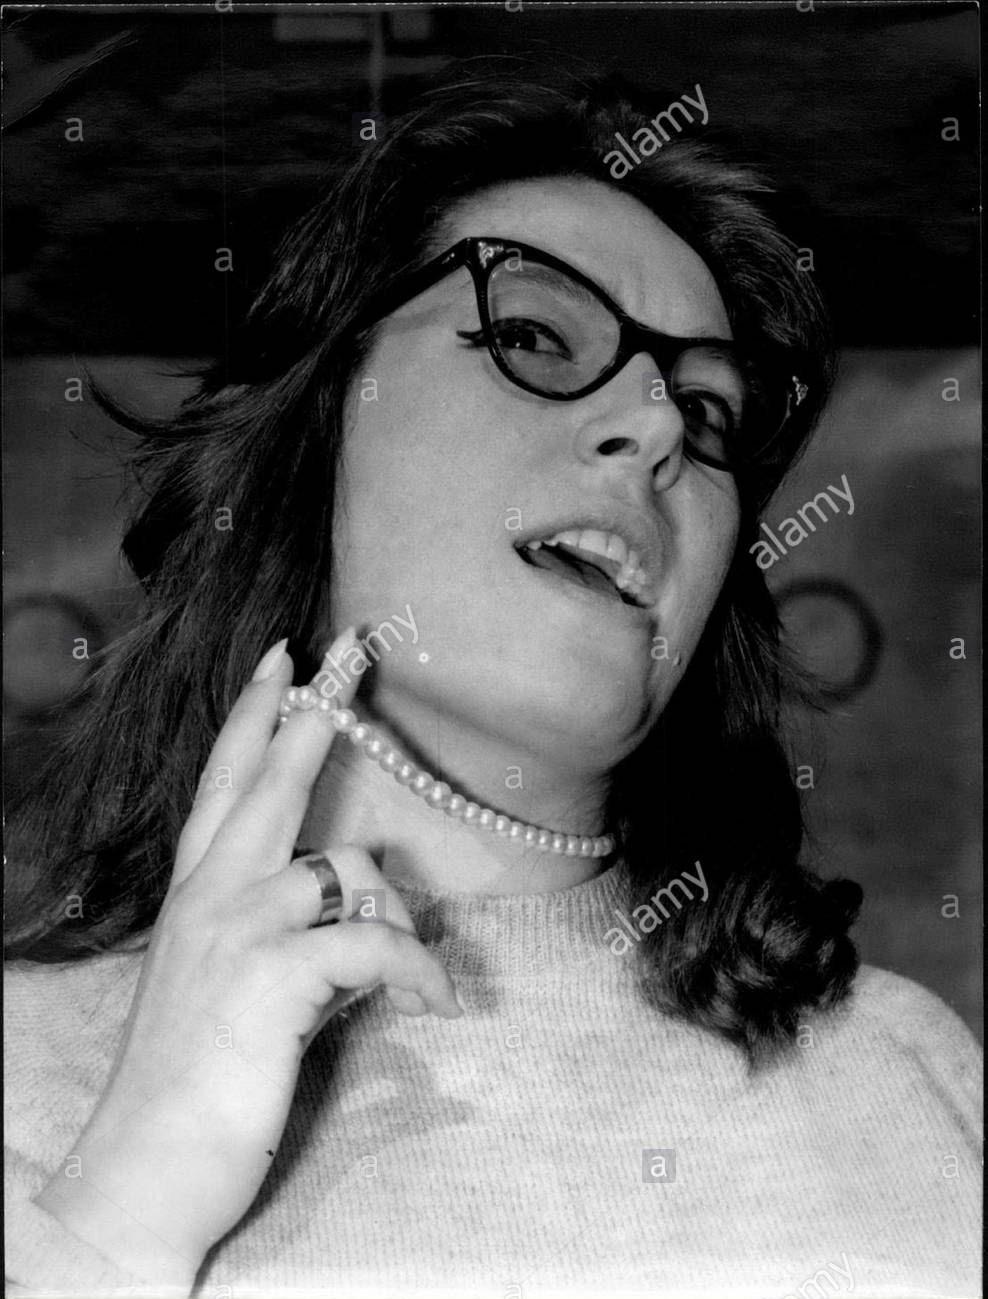 Nana Mouskouri - 101061 (1)